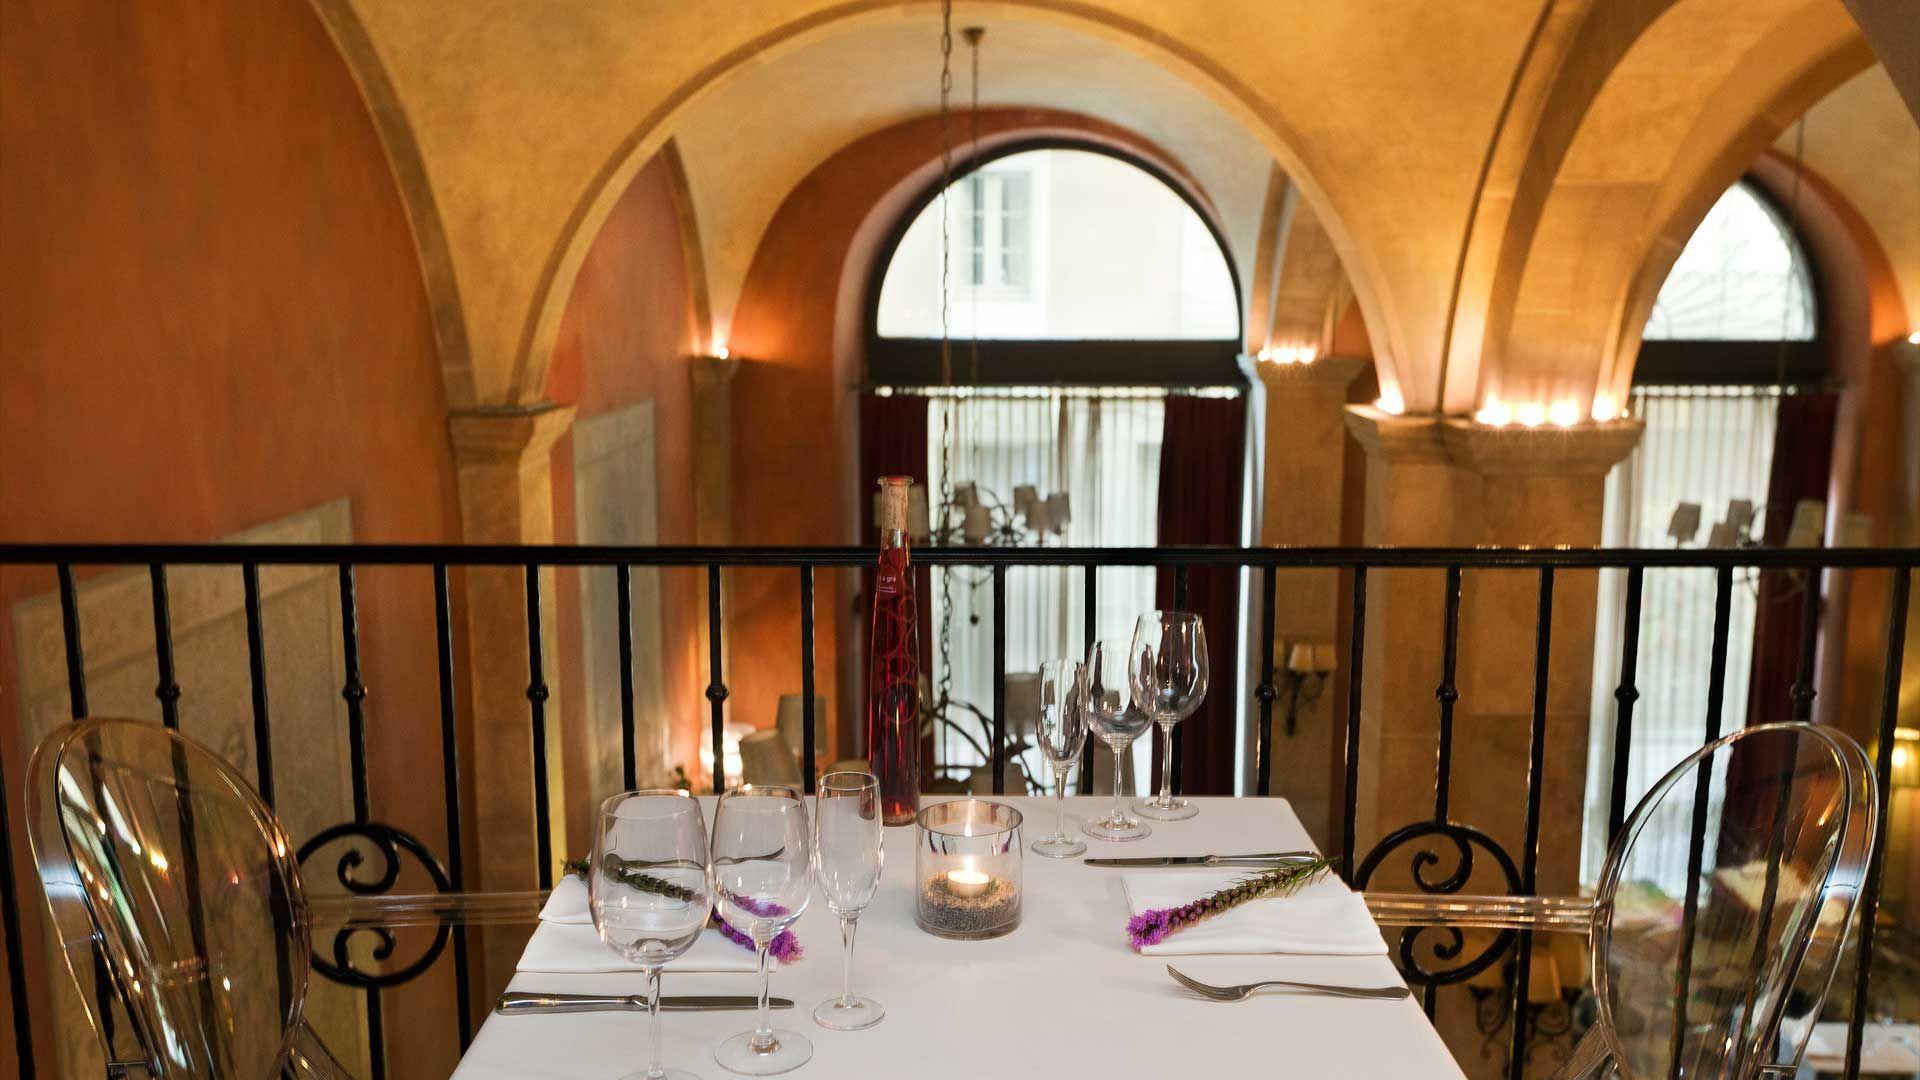 Hotel duquesa de cardona barcelona hotel barcelona - Hotel duques de cardona ...